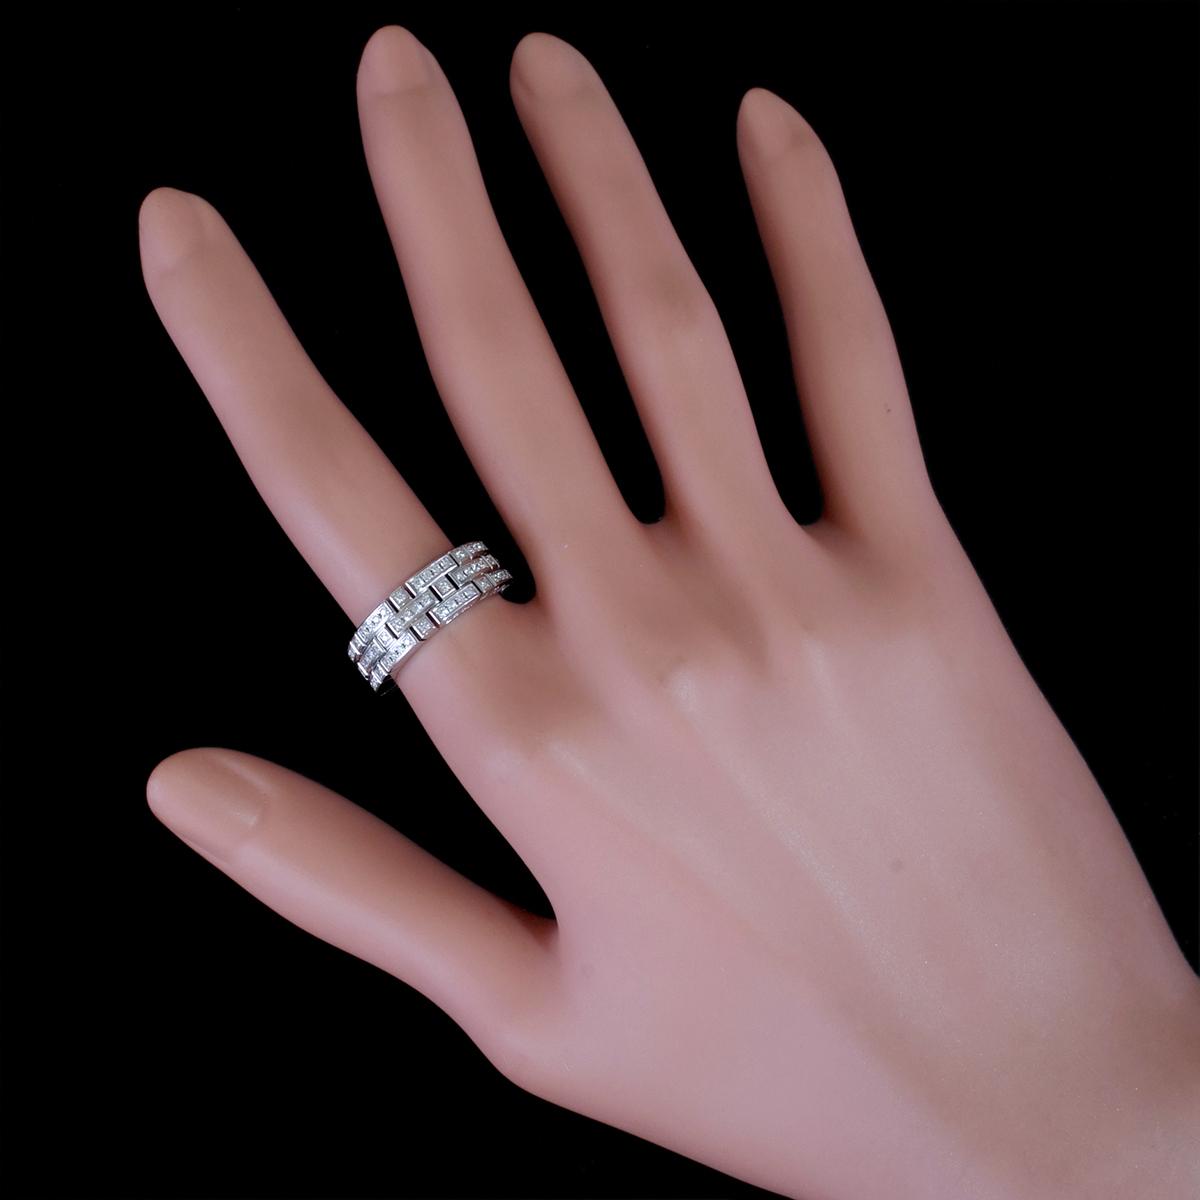 E8222【LEON HATOT】レオンアト 天然絶品ダイヤモンド116pcs 最高級18金WG無垢リング サイズ16号 重量15.8g 縦幅6.7mm_画像4